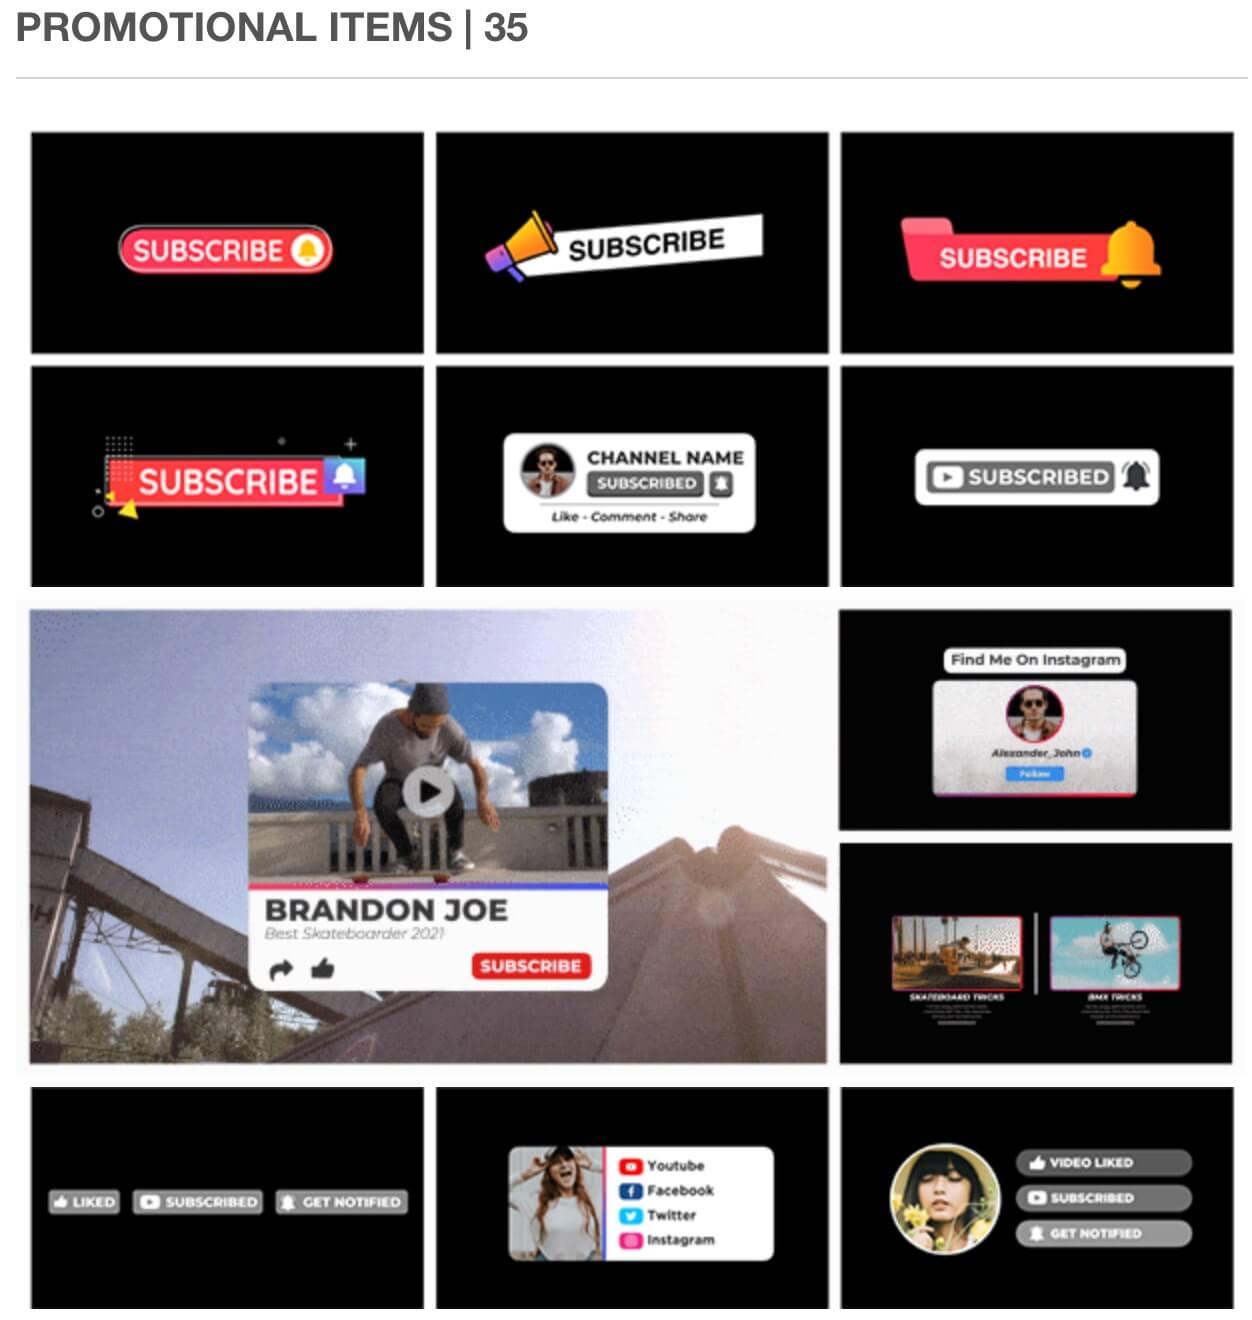 fcpx插件 558个社交媒体字幕条标题图文排版设计宣传介绍LOGO图形动画